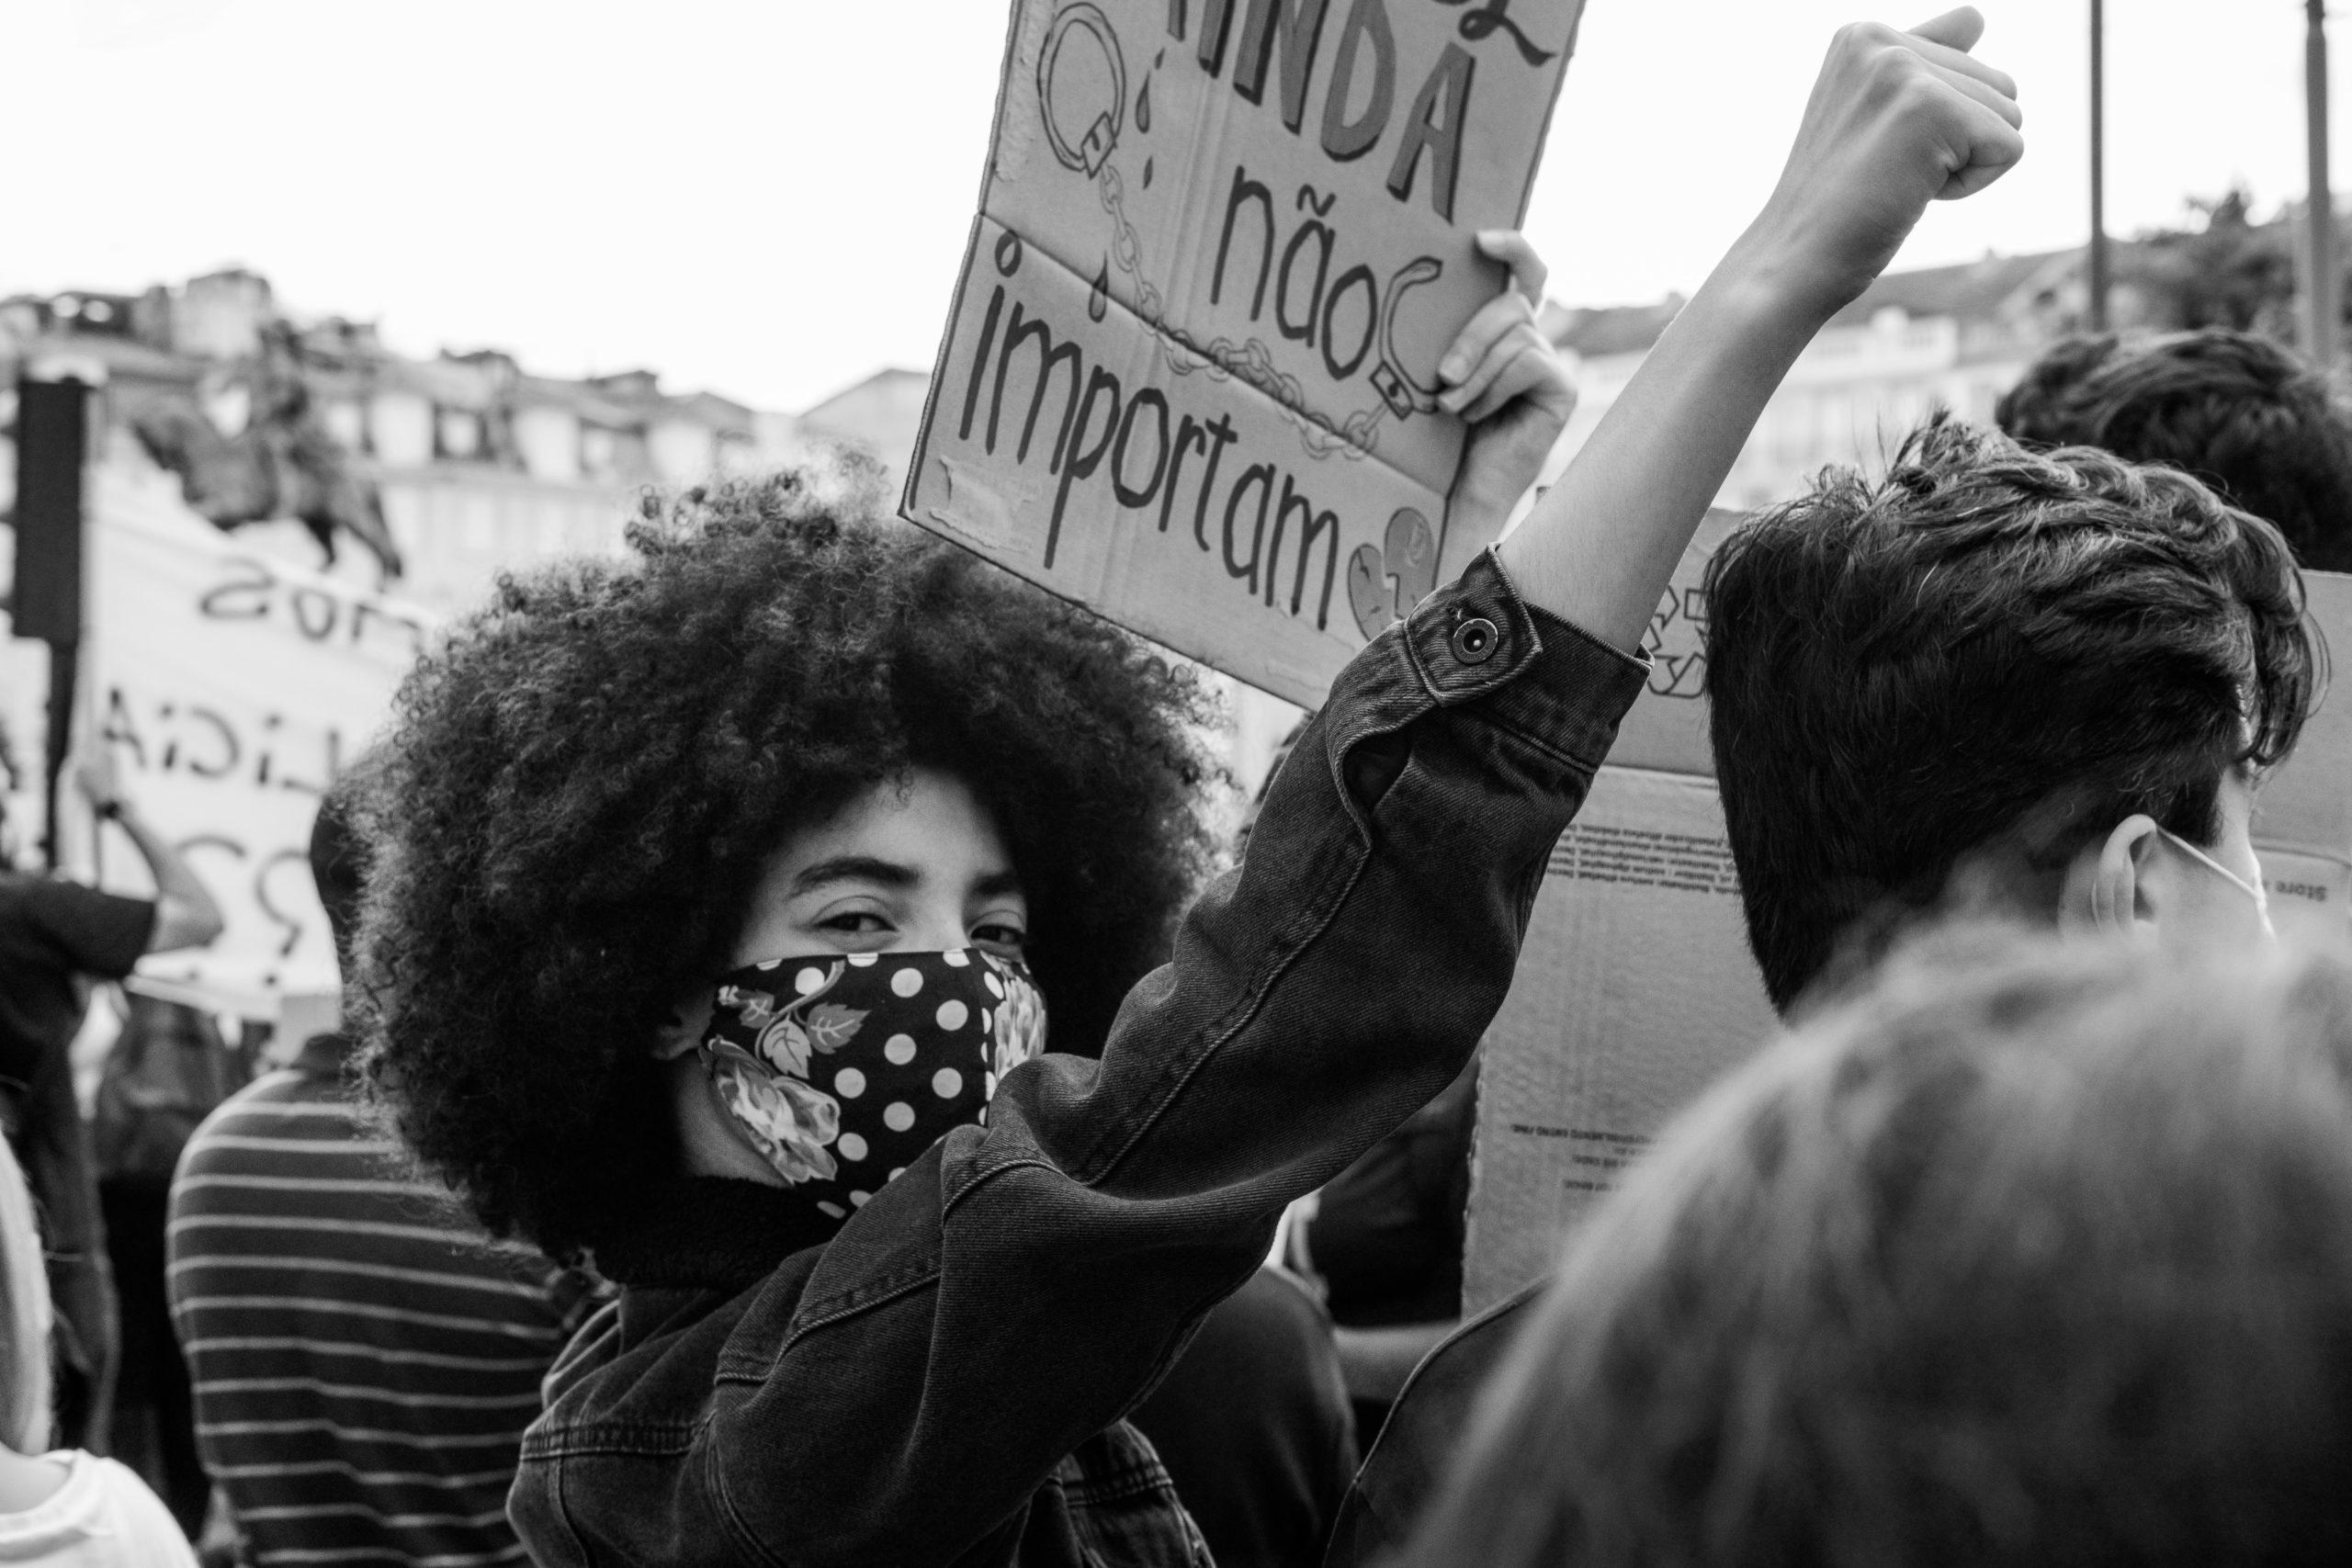 Alex Paganelli, Black lives Matter Protest, Lisbon, 6 June 2020